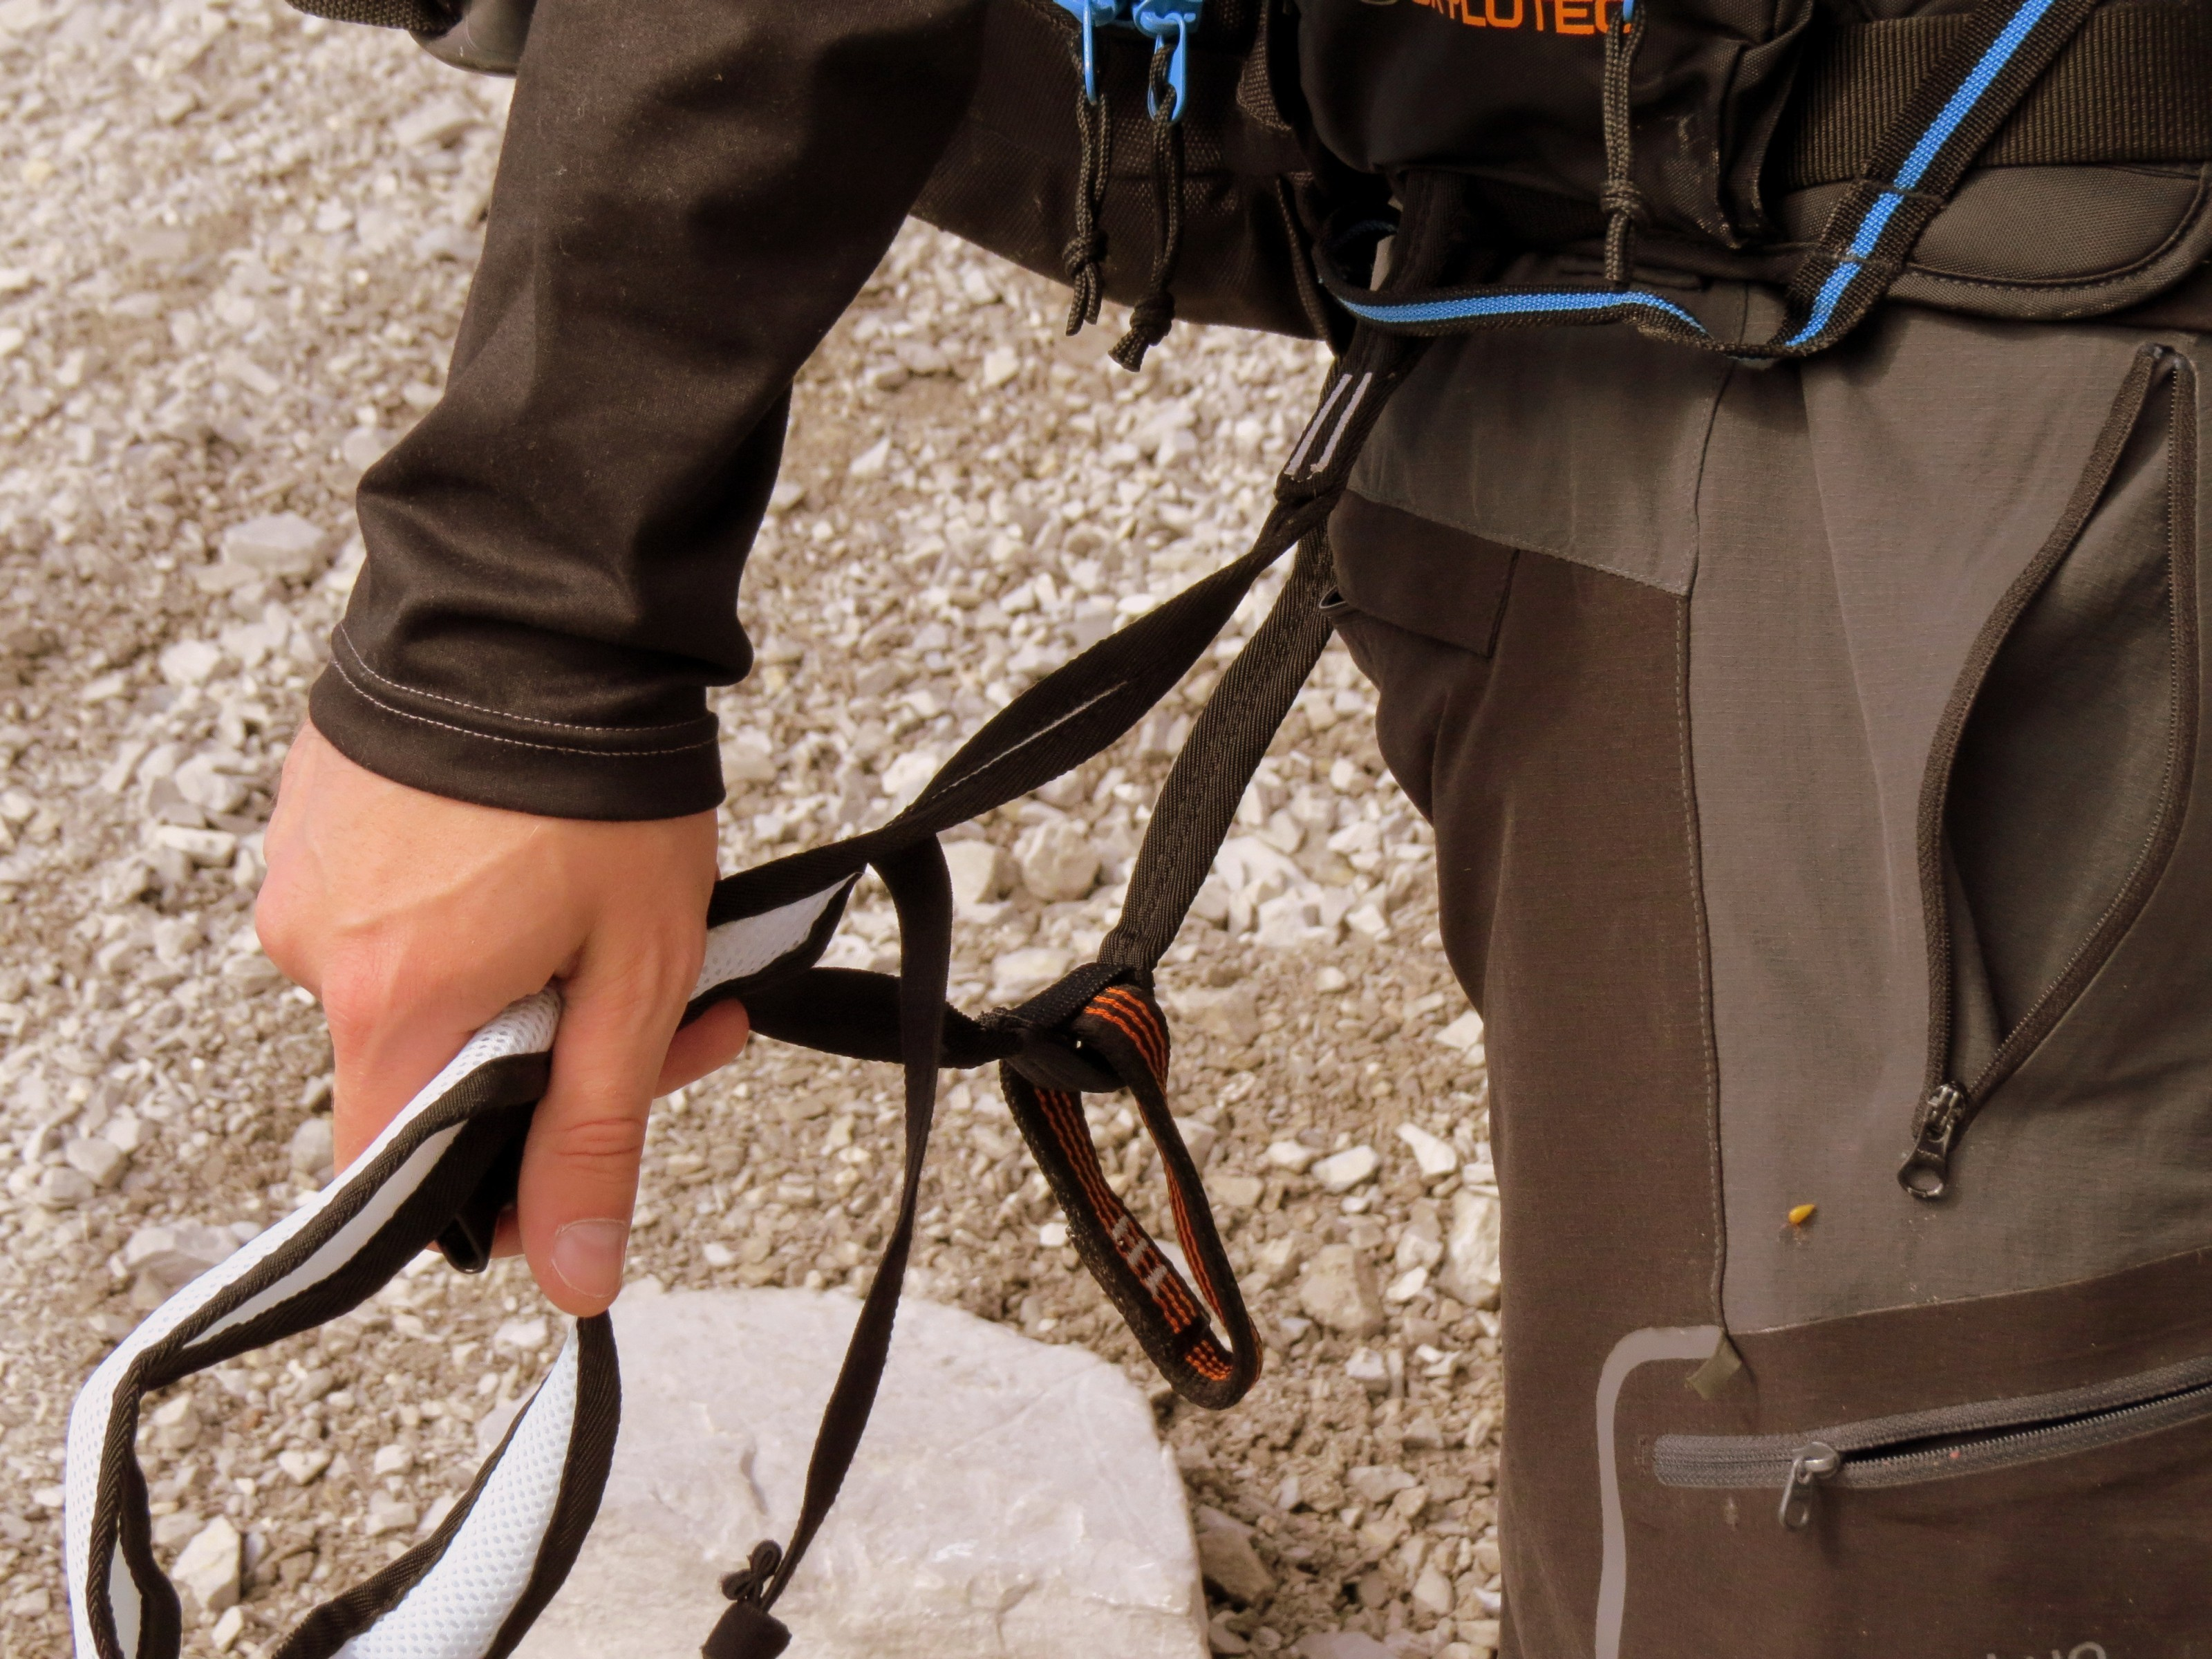 Skylotec Klettergurt Test : Rucksack im test der skylotec mit integriertem